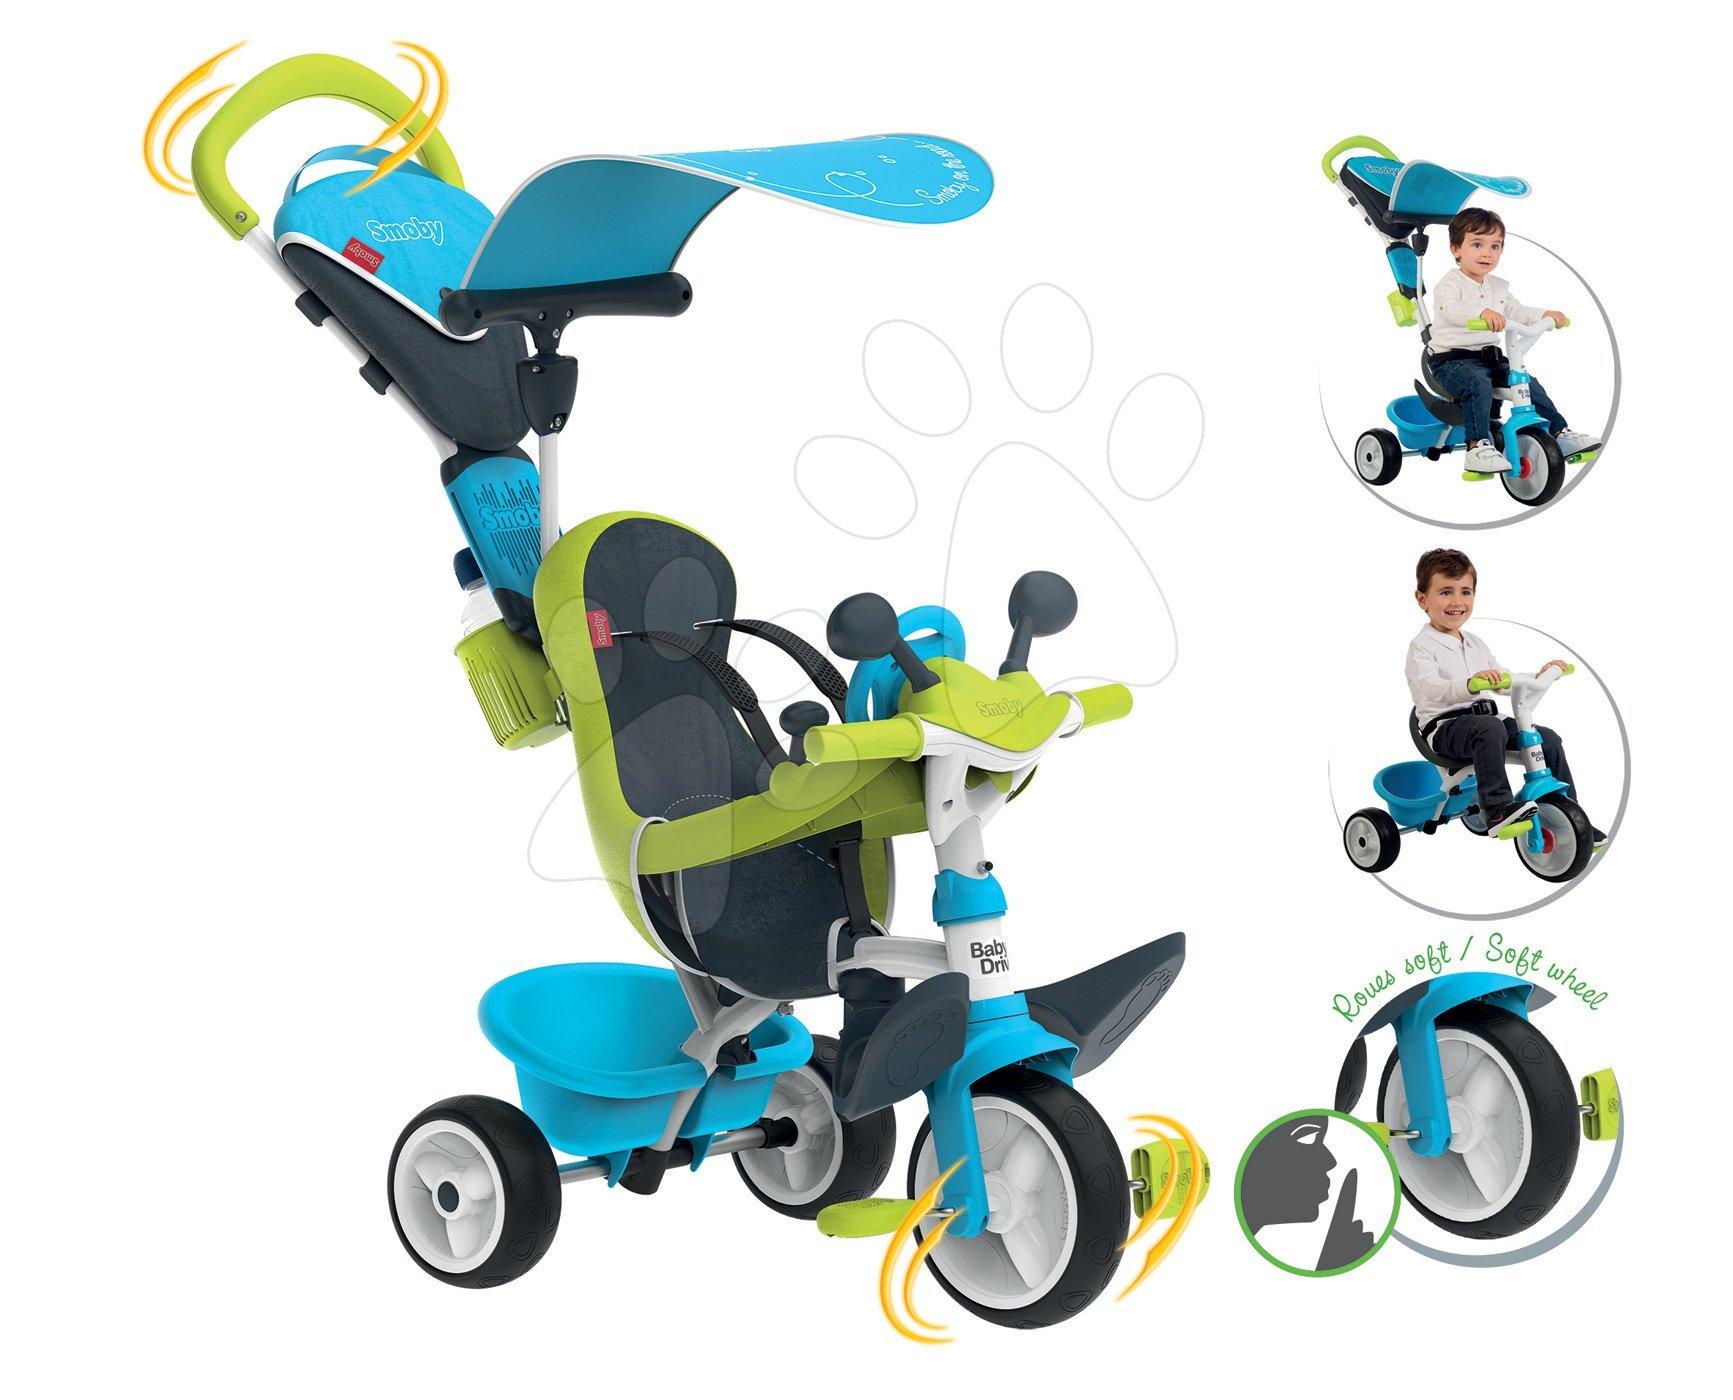 Smoby trojkolka Baby Driver Comfort Blue Smoby s EVA kolieskami modrá 741200